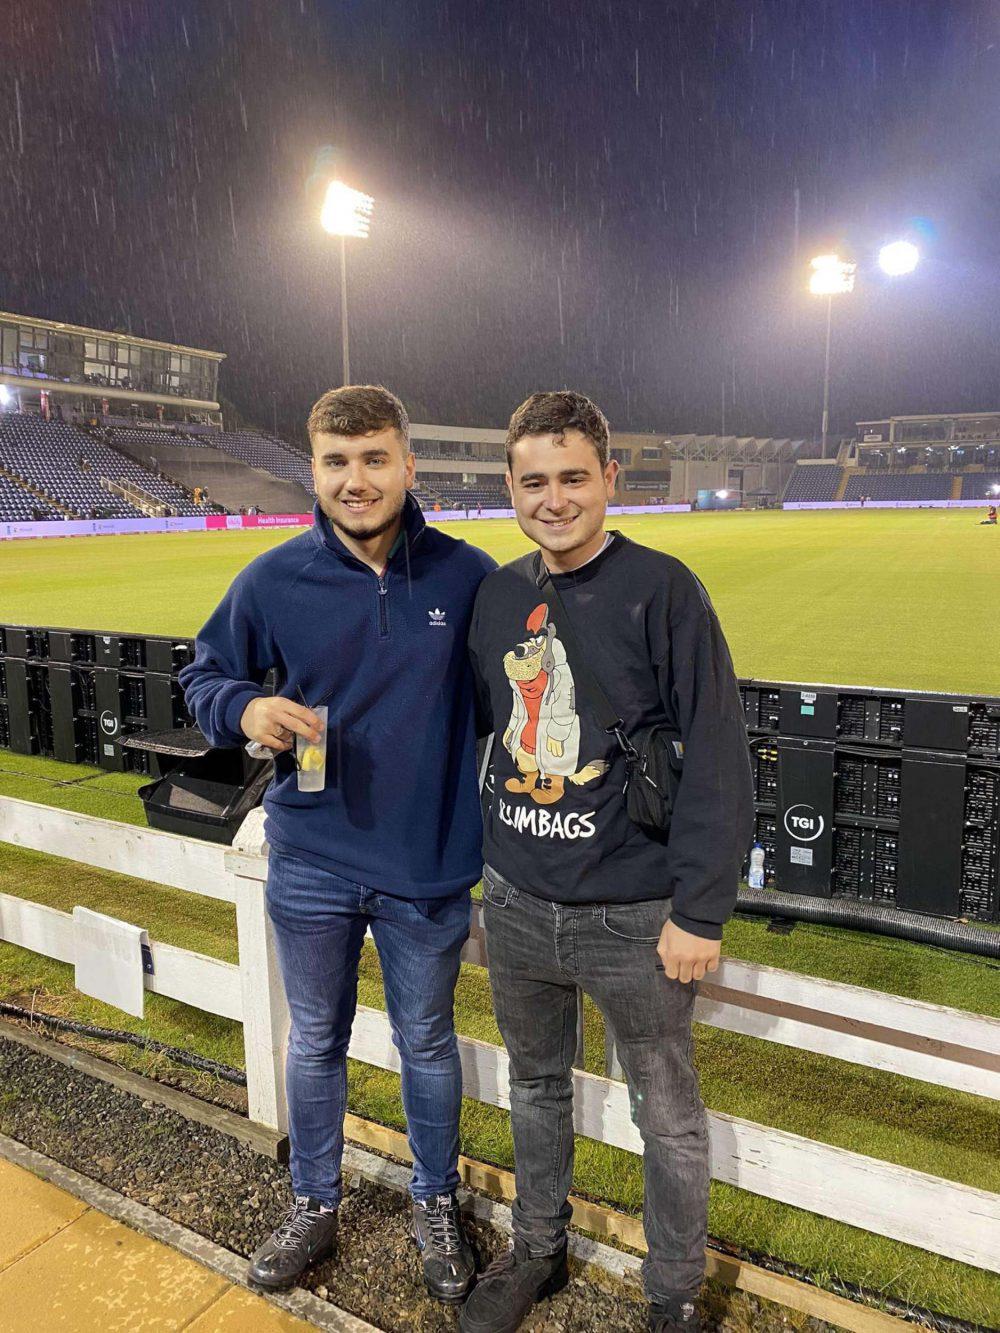 Josh Wall and Owen Hopkins - football news UK